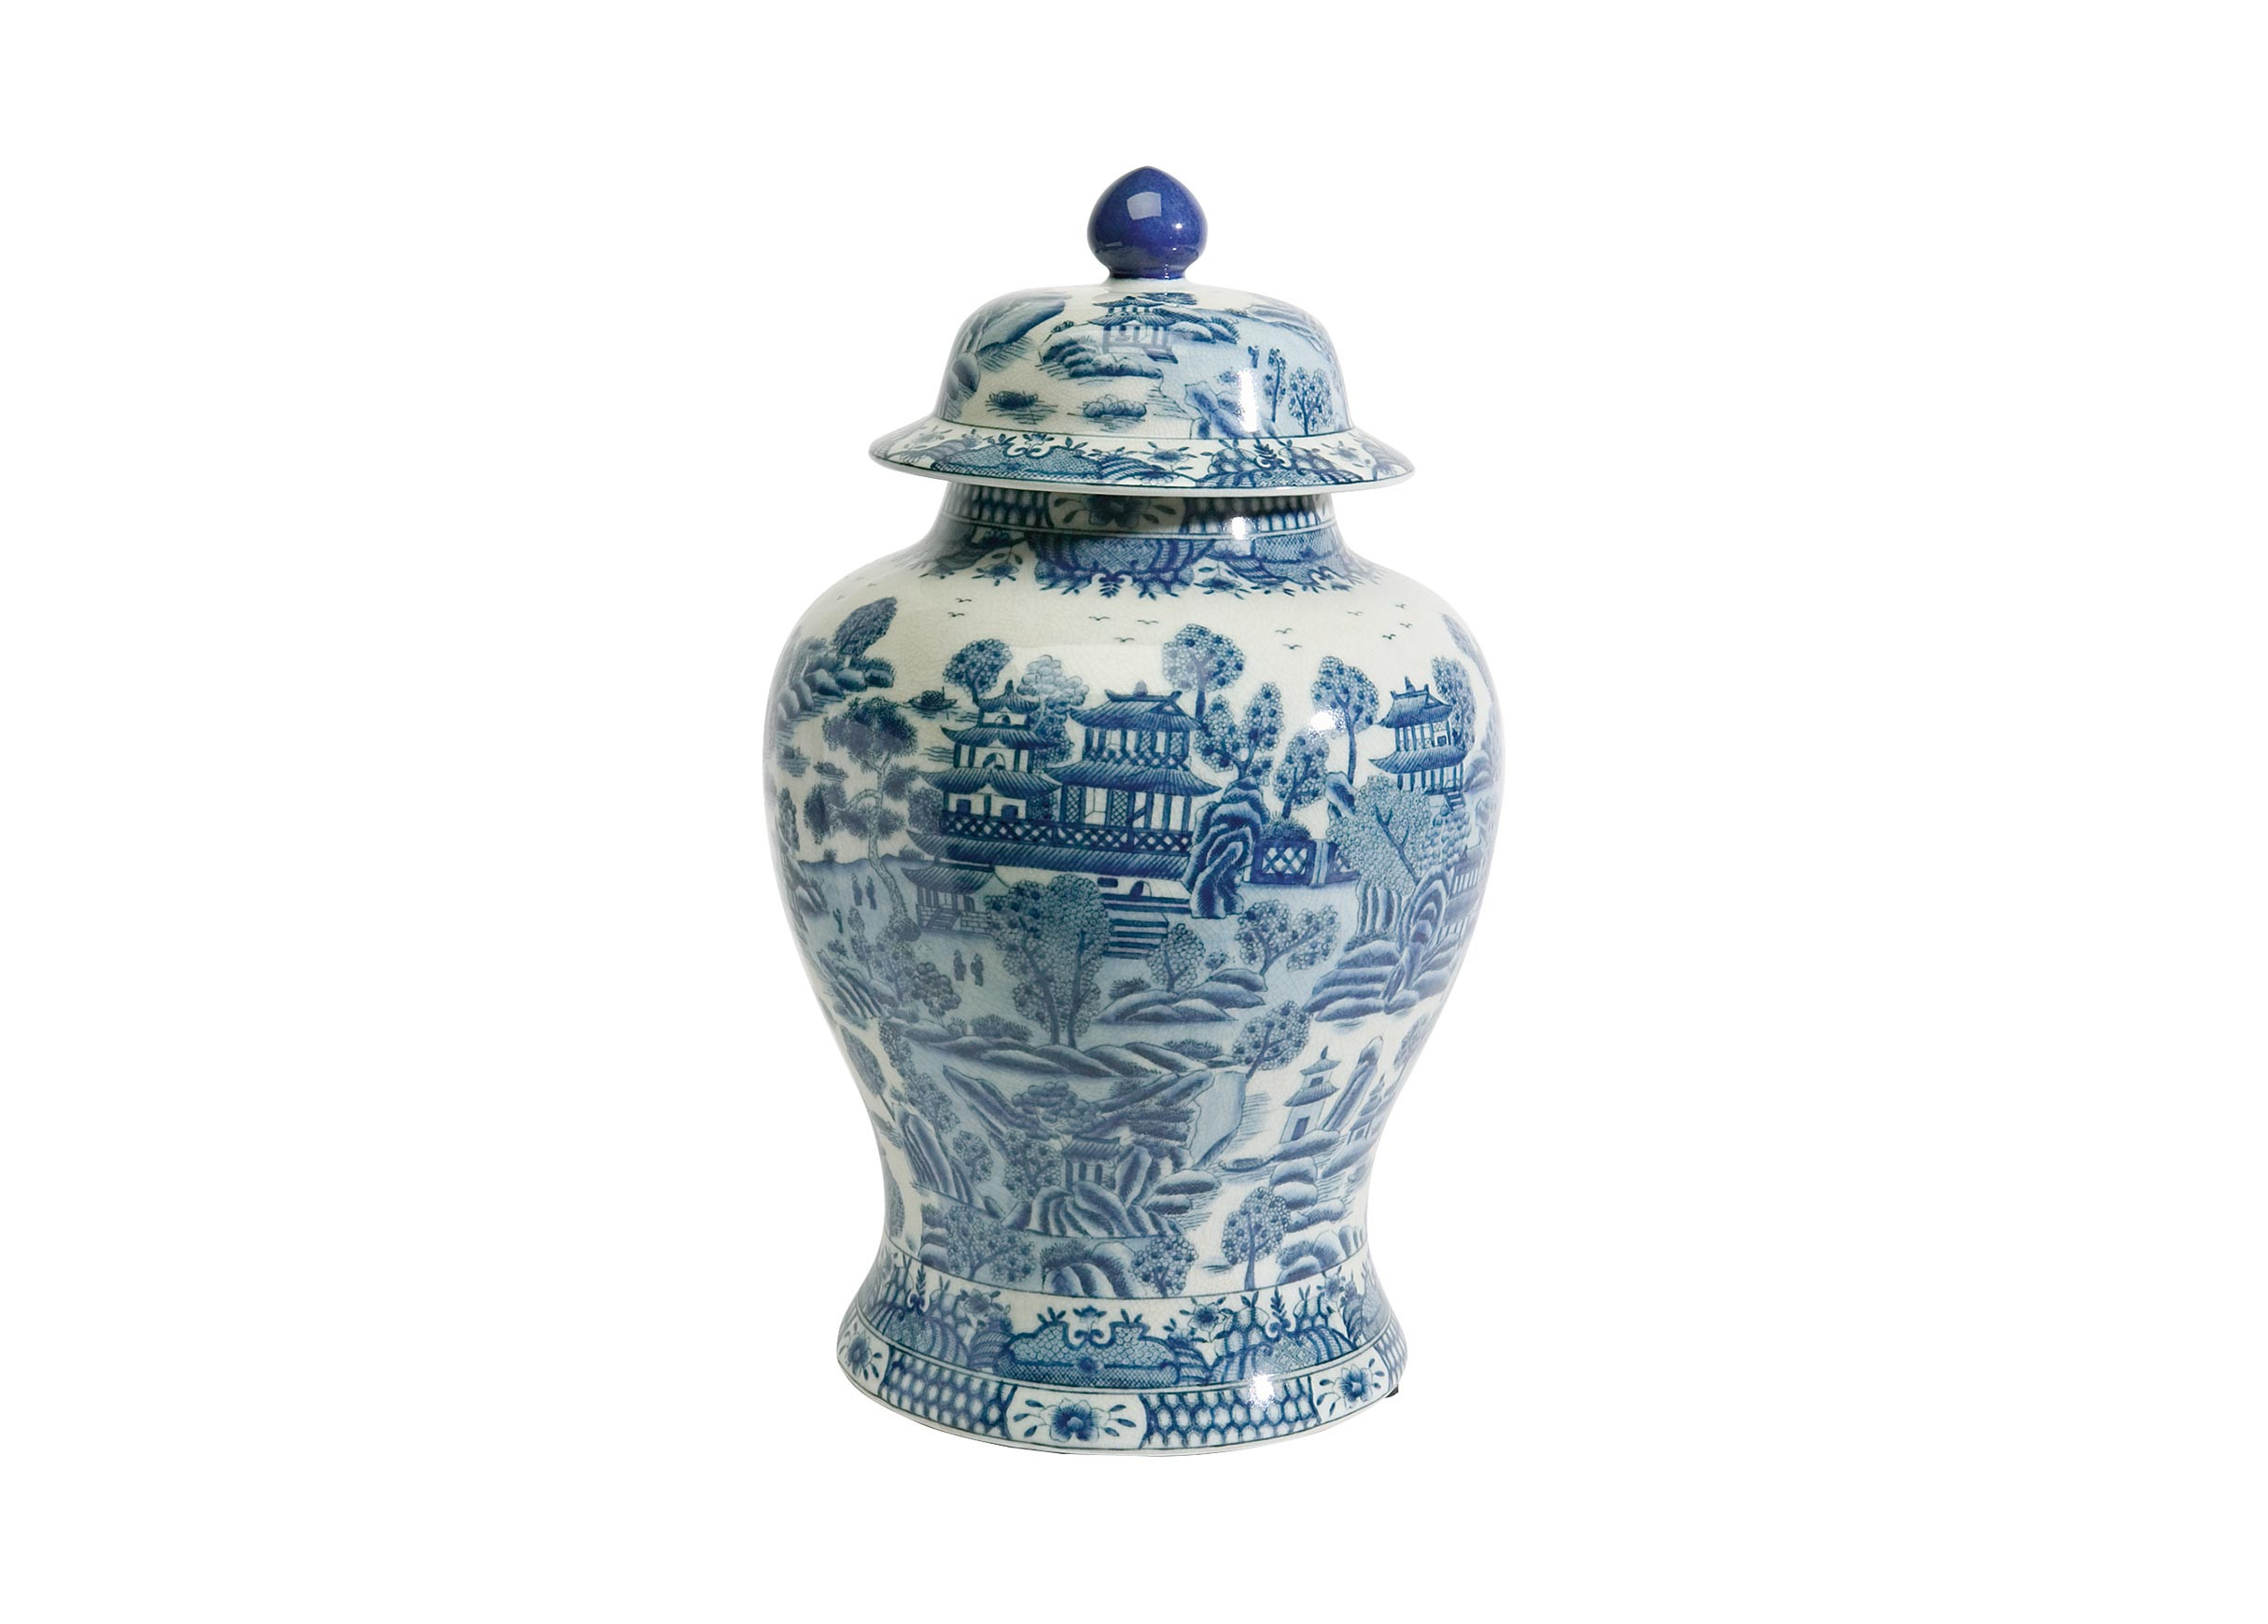 antique cloisonne vase value of green and white ginger jar droughtrelief org intended for large ginger jar with lid jars ethan allen